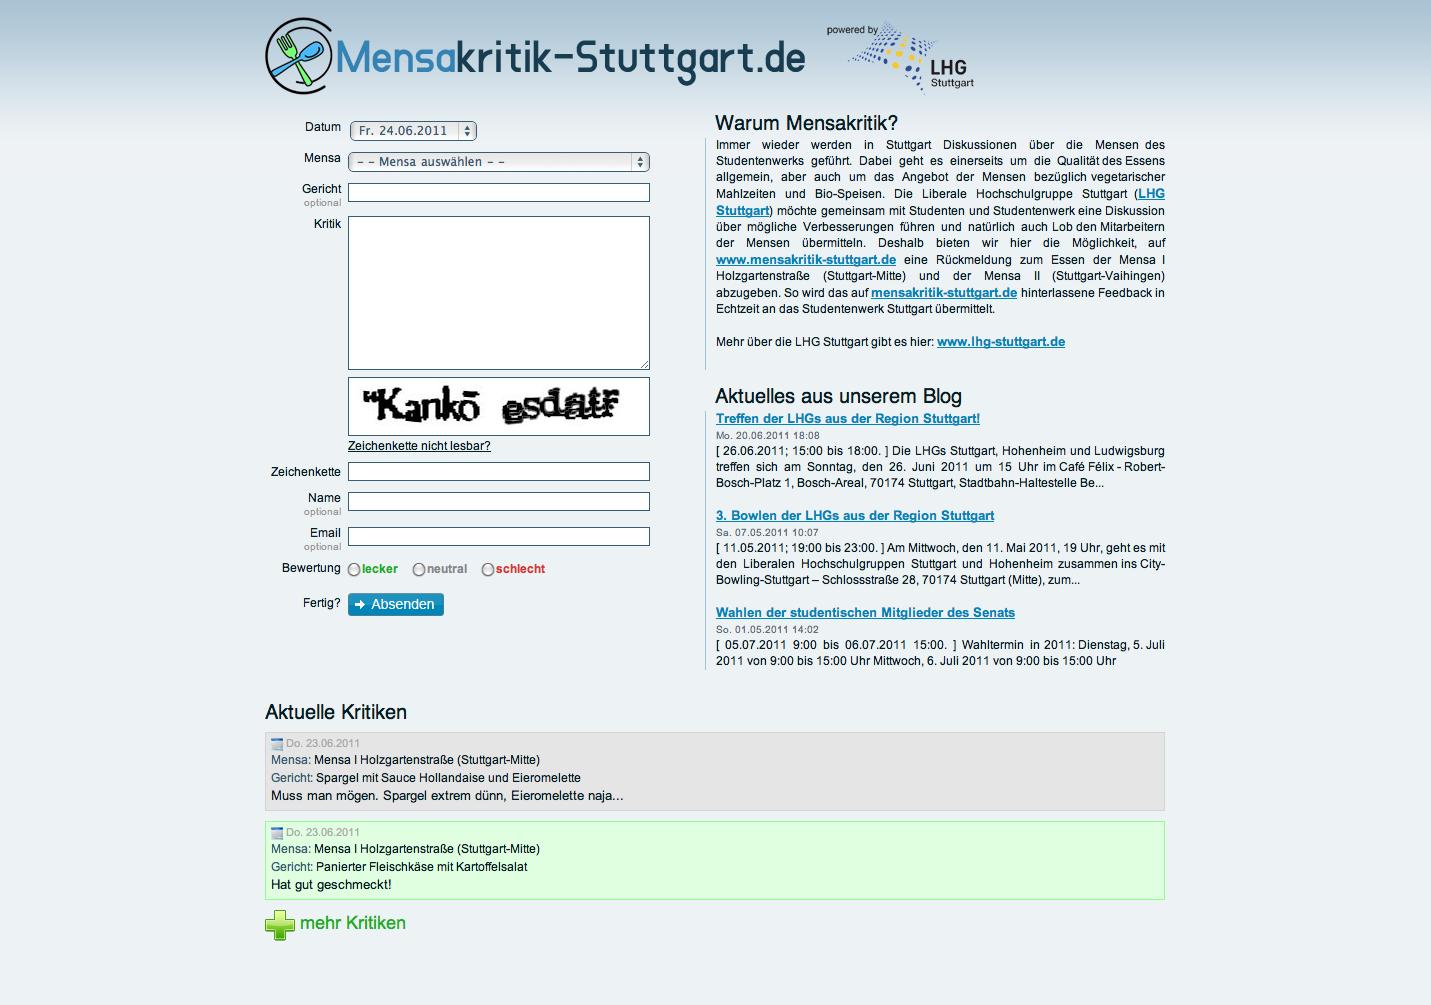 Mensakritik-Stuttgart.de